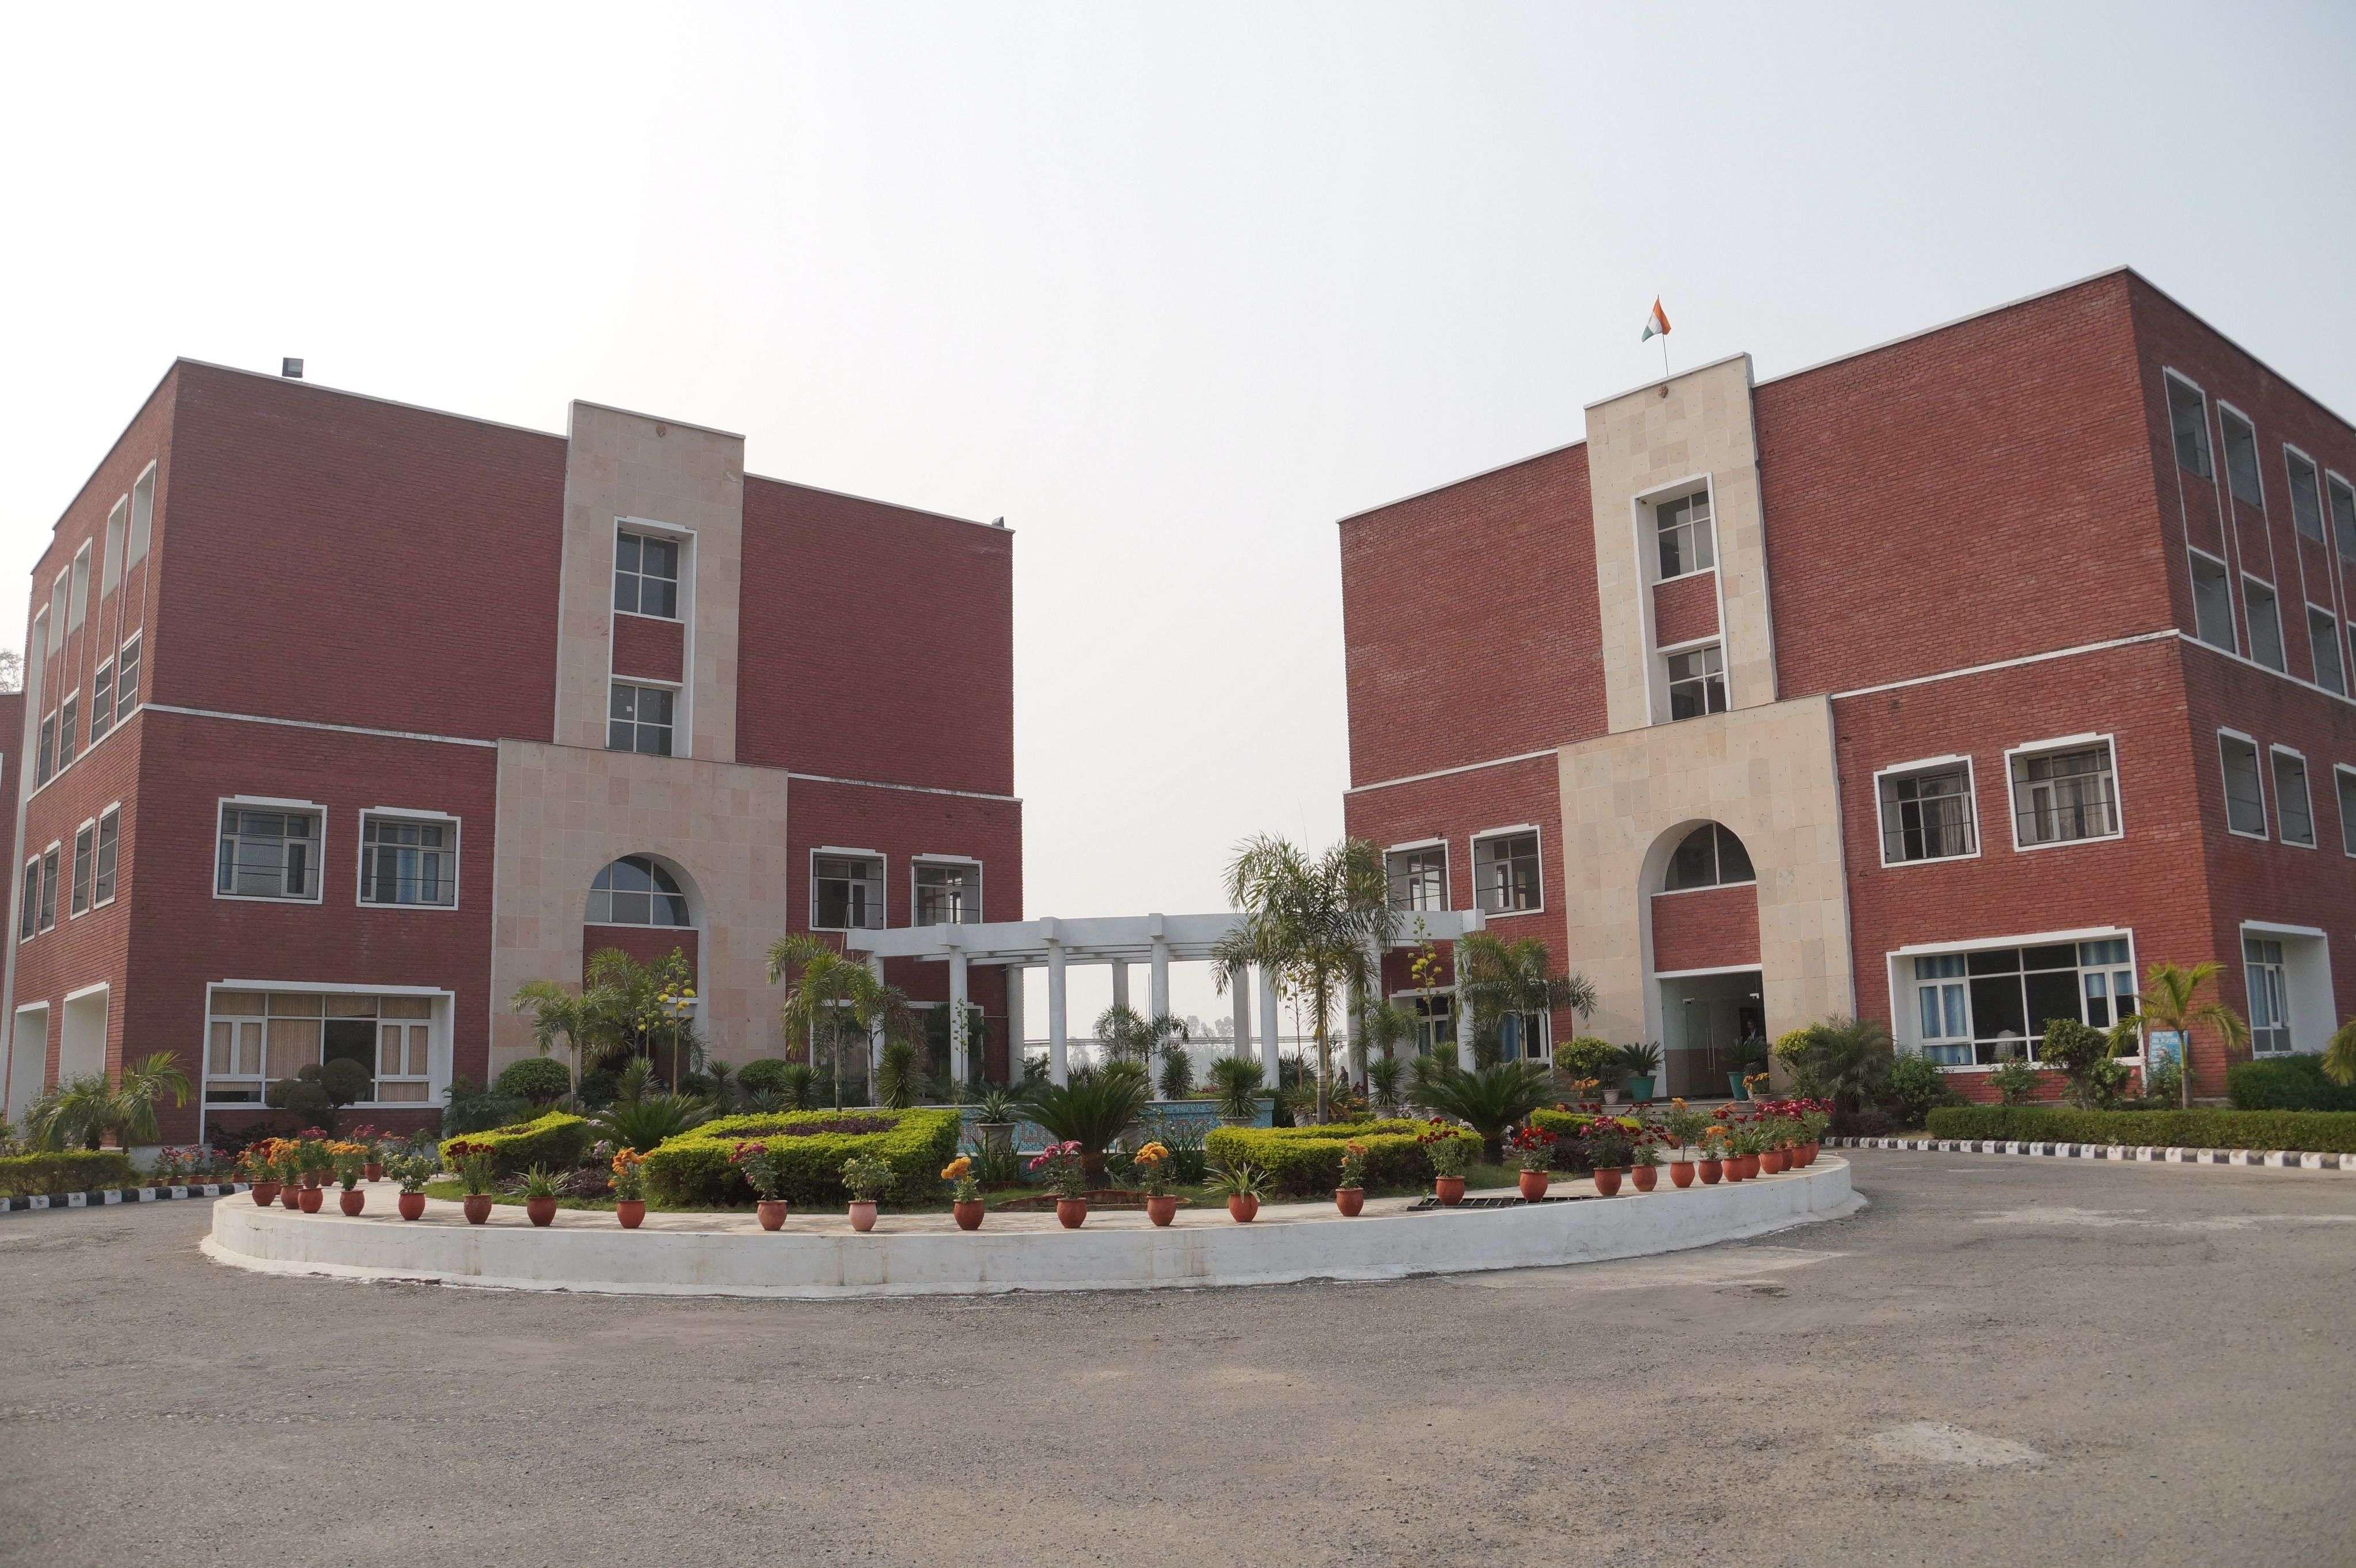 Cygnus High World school Cygnus high World School Shahabad Saha Panchkula Highway Vill Shergarh Distt Ambala Haryana 530883